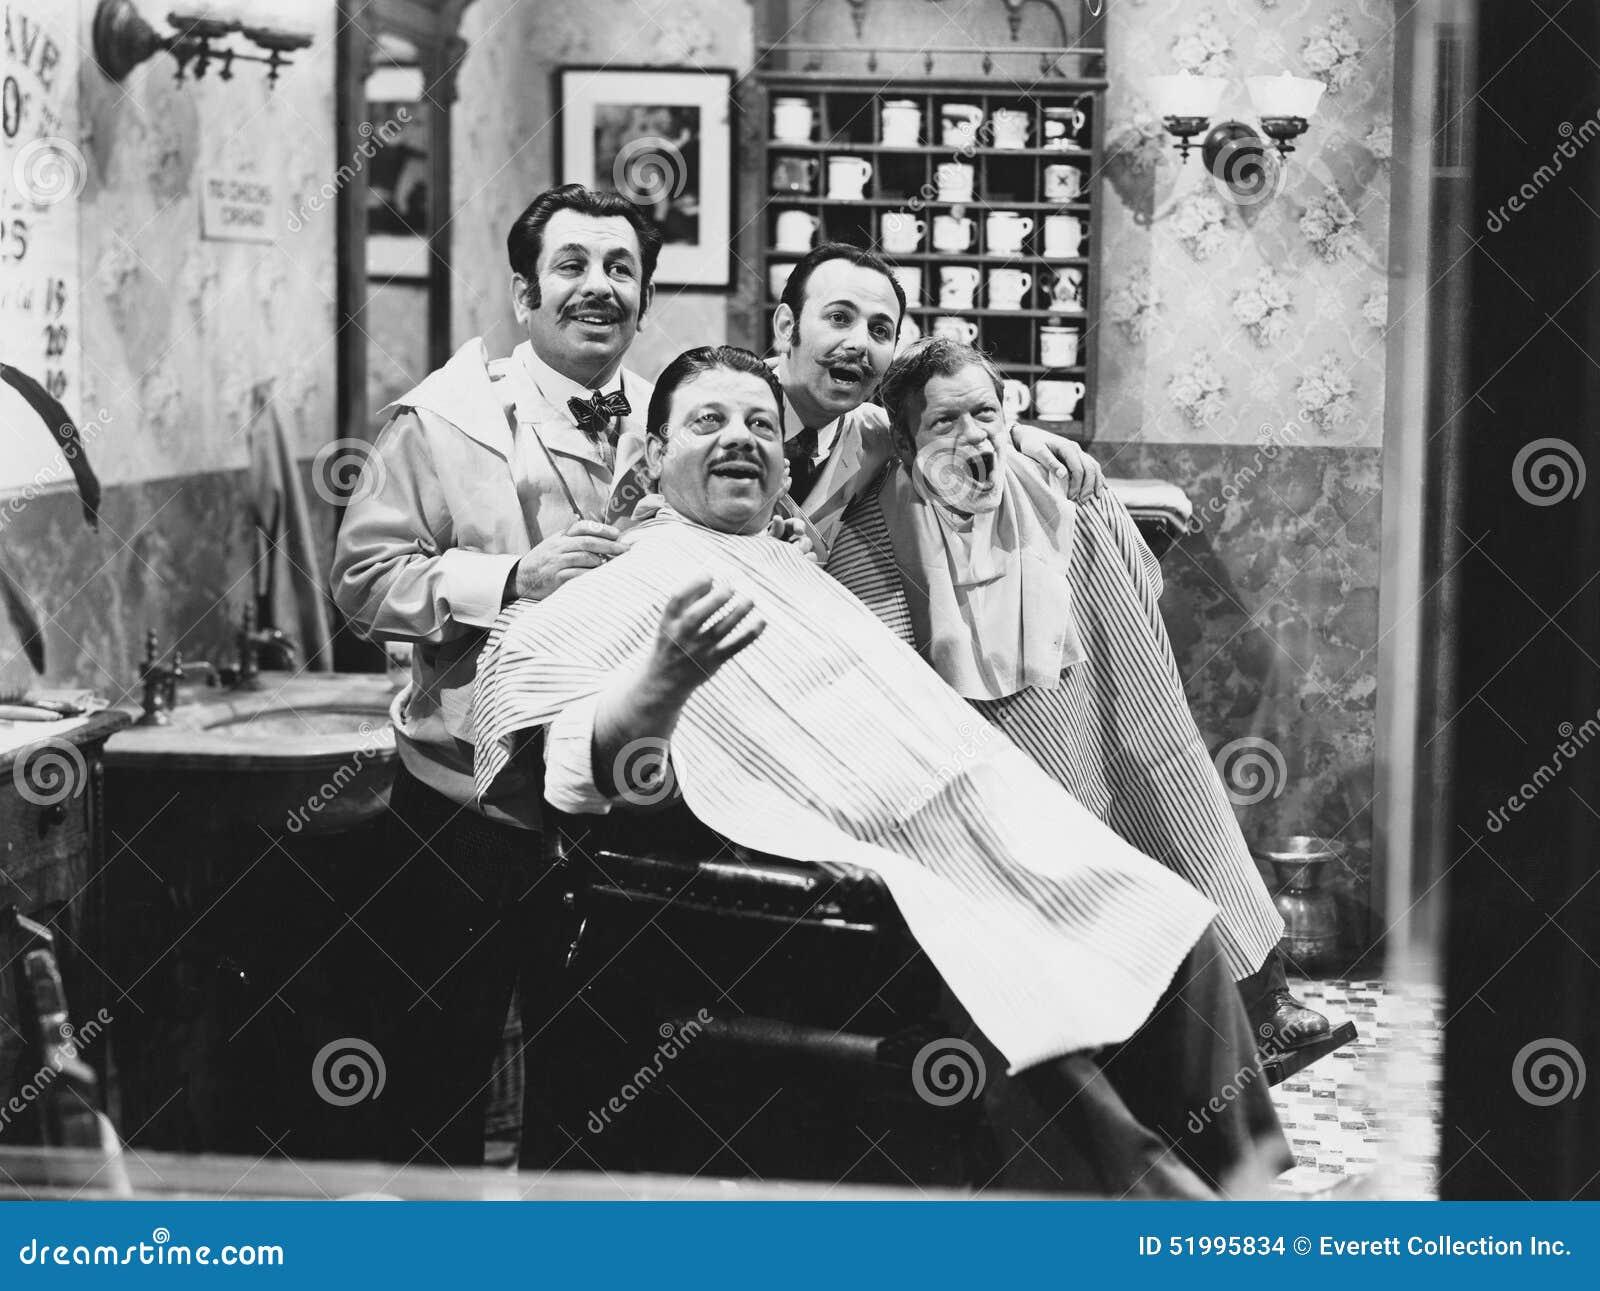 Barber Quartet : BARBERSHOP QUARTET (All persons depicted are no longer living and no ...